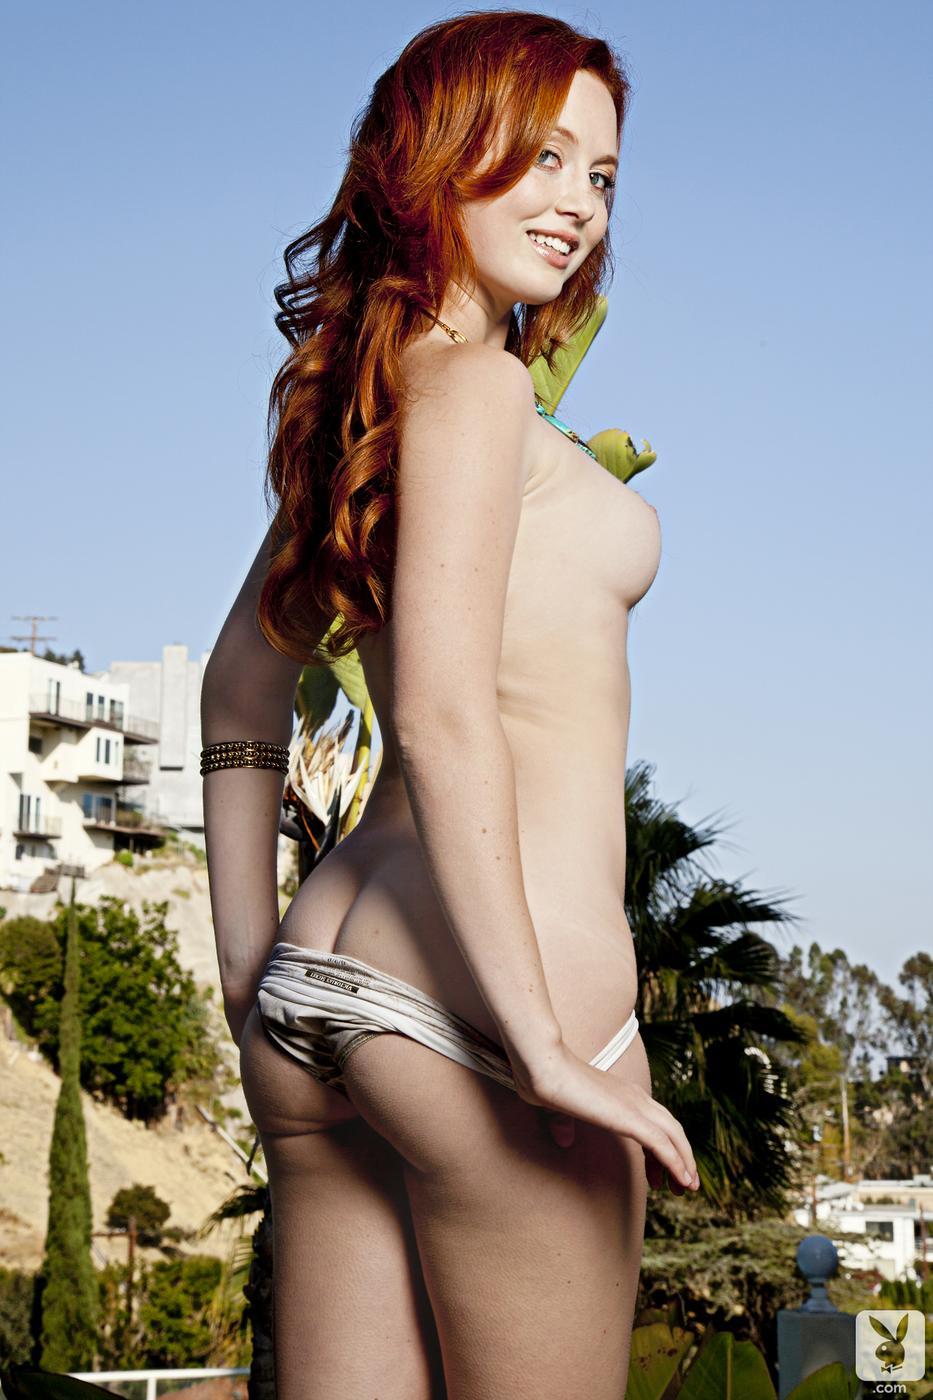 molly-shaw-bikini-balcony-playboy-09